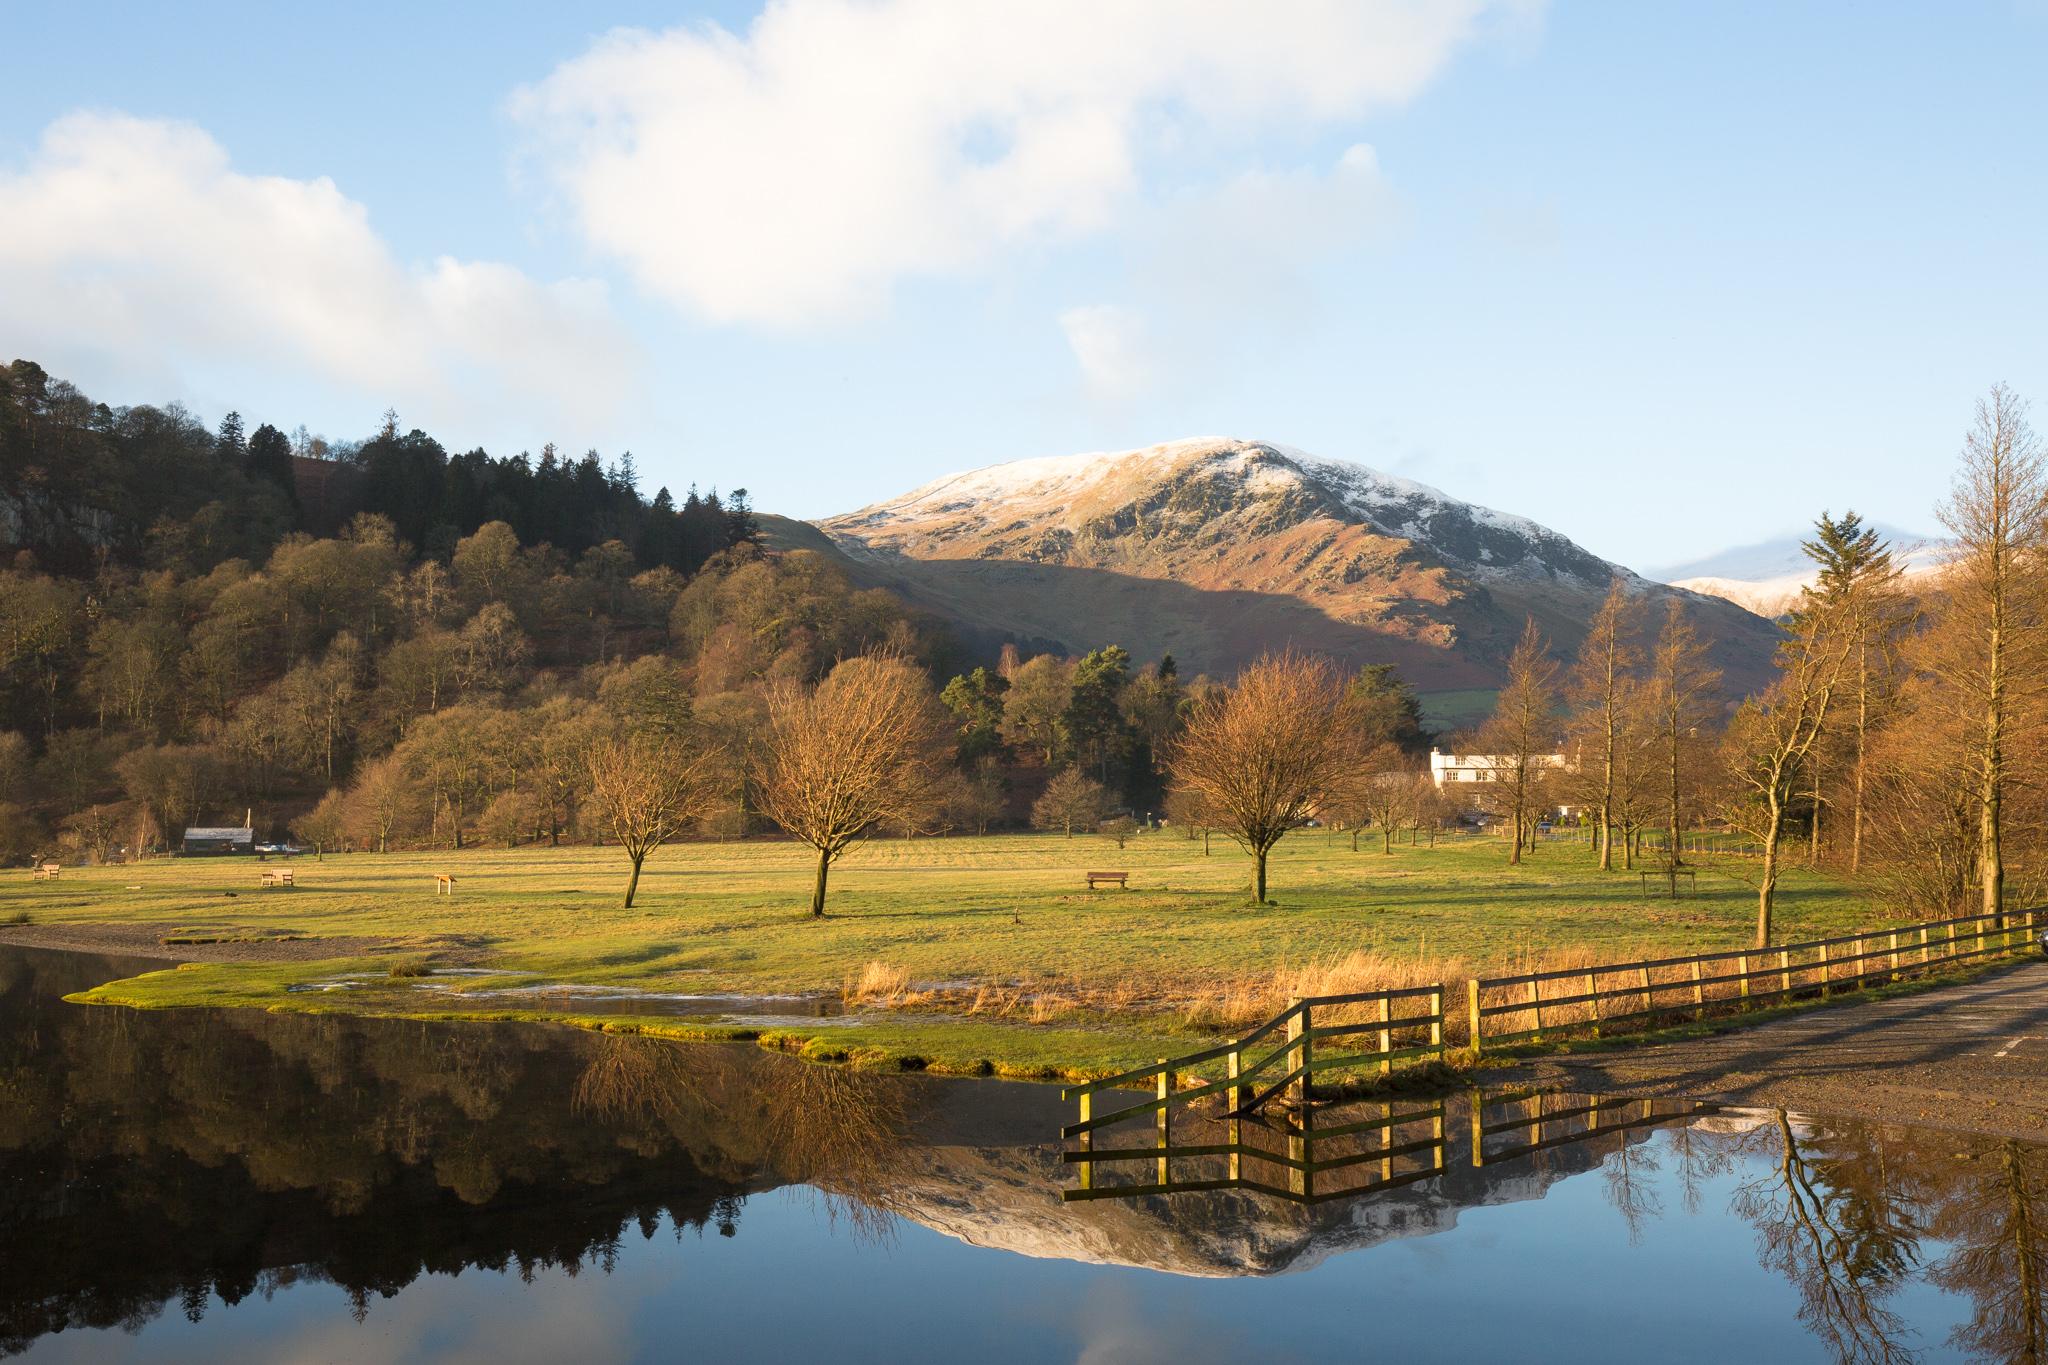 2621-uk-award-winning-landscape-photography.jpg